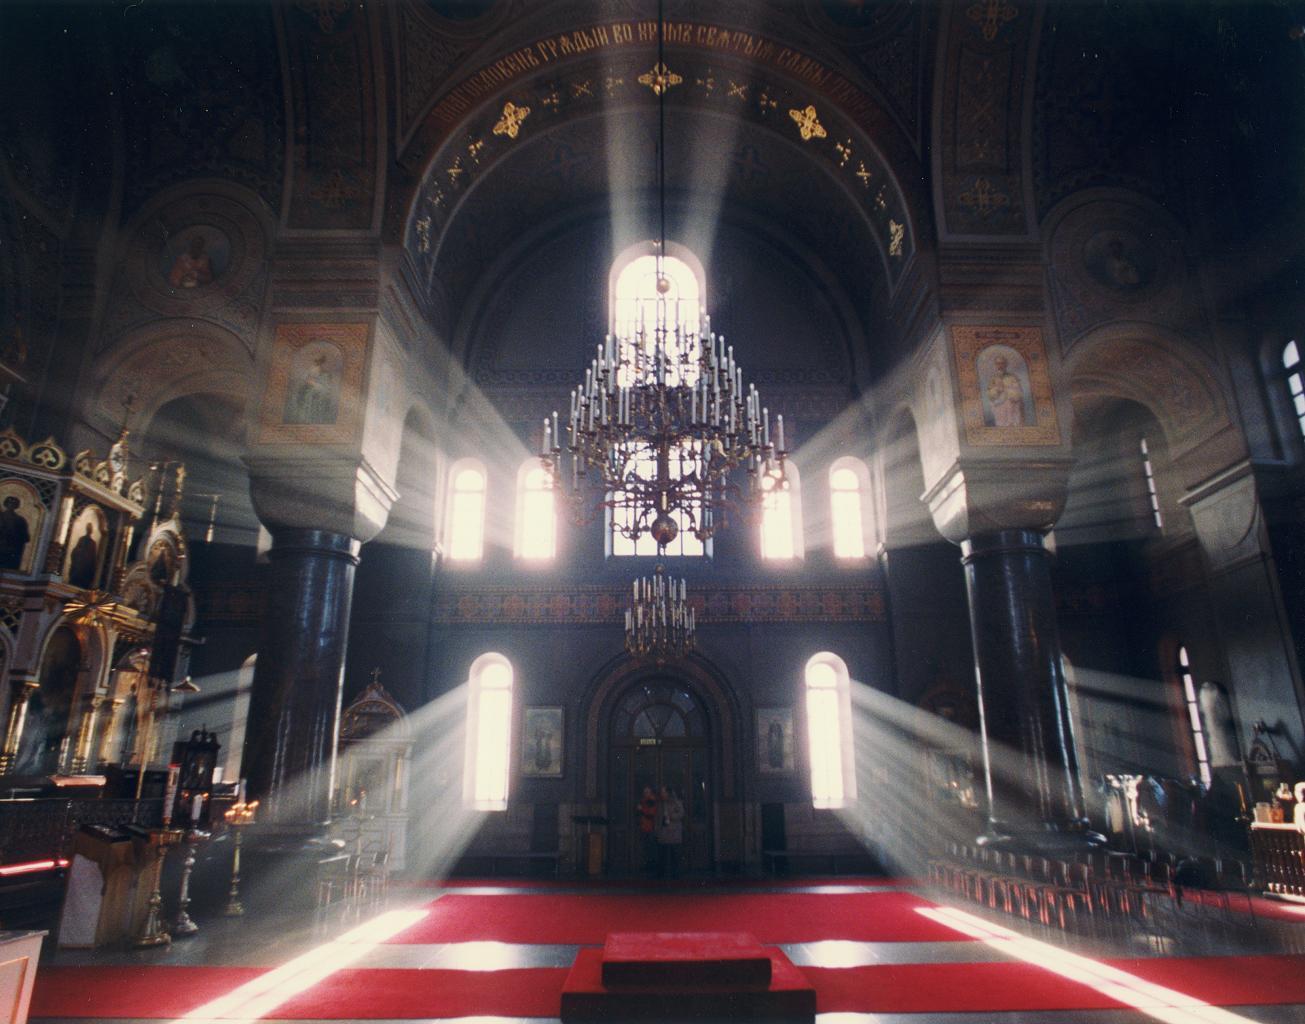 Knights Templar Wallpaper Iphone Light In Church Wallpaper Christian Wallpapers And